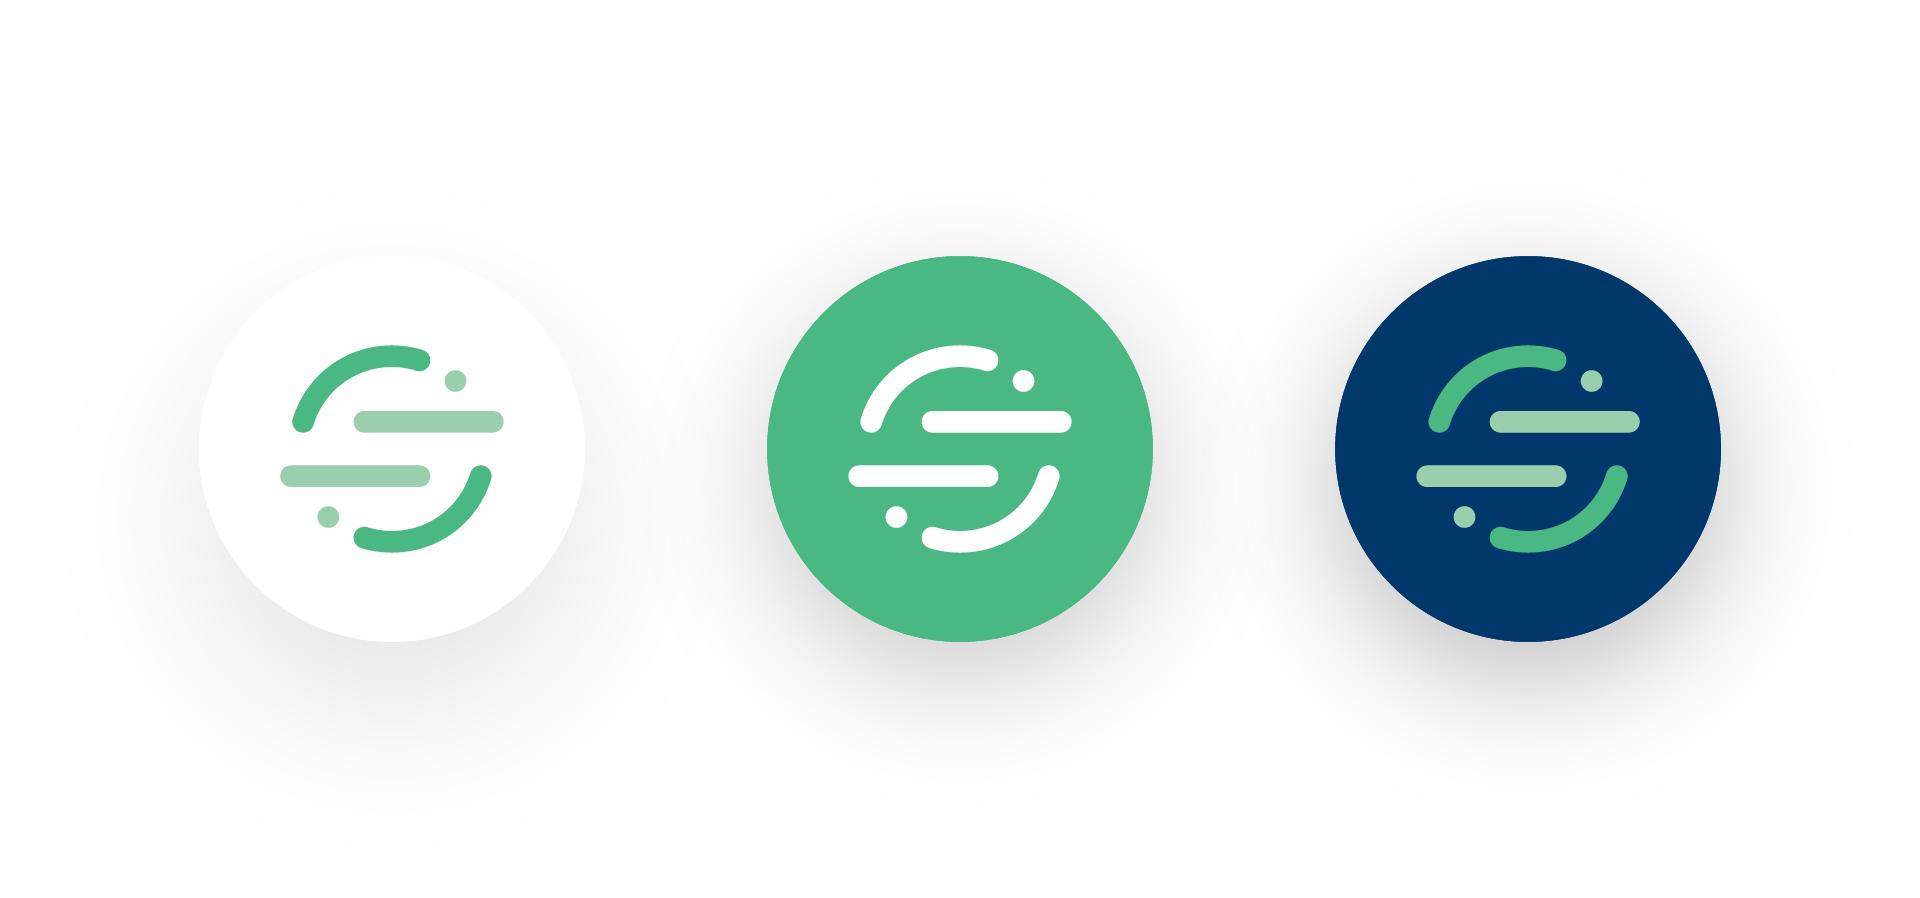 Segment logomark - Static and animated versions